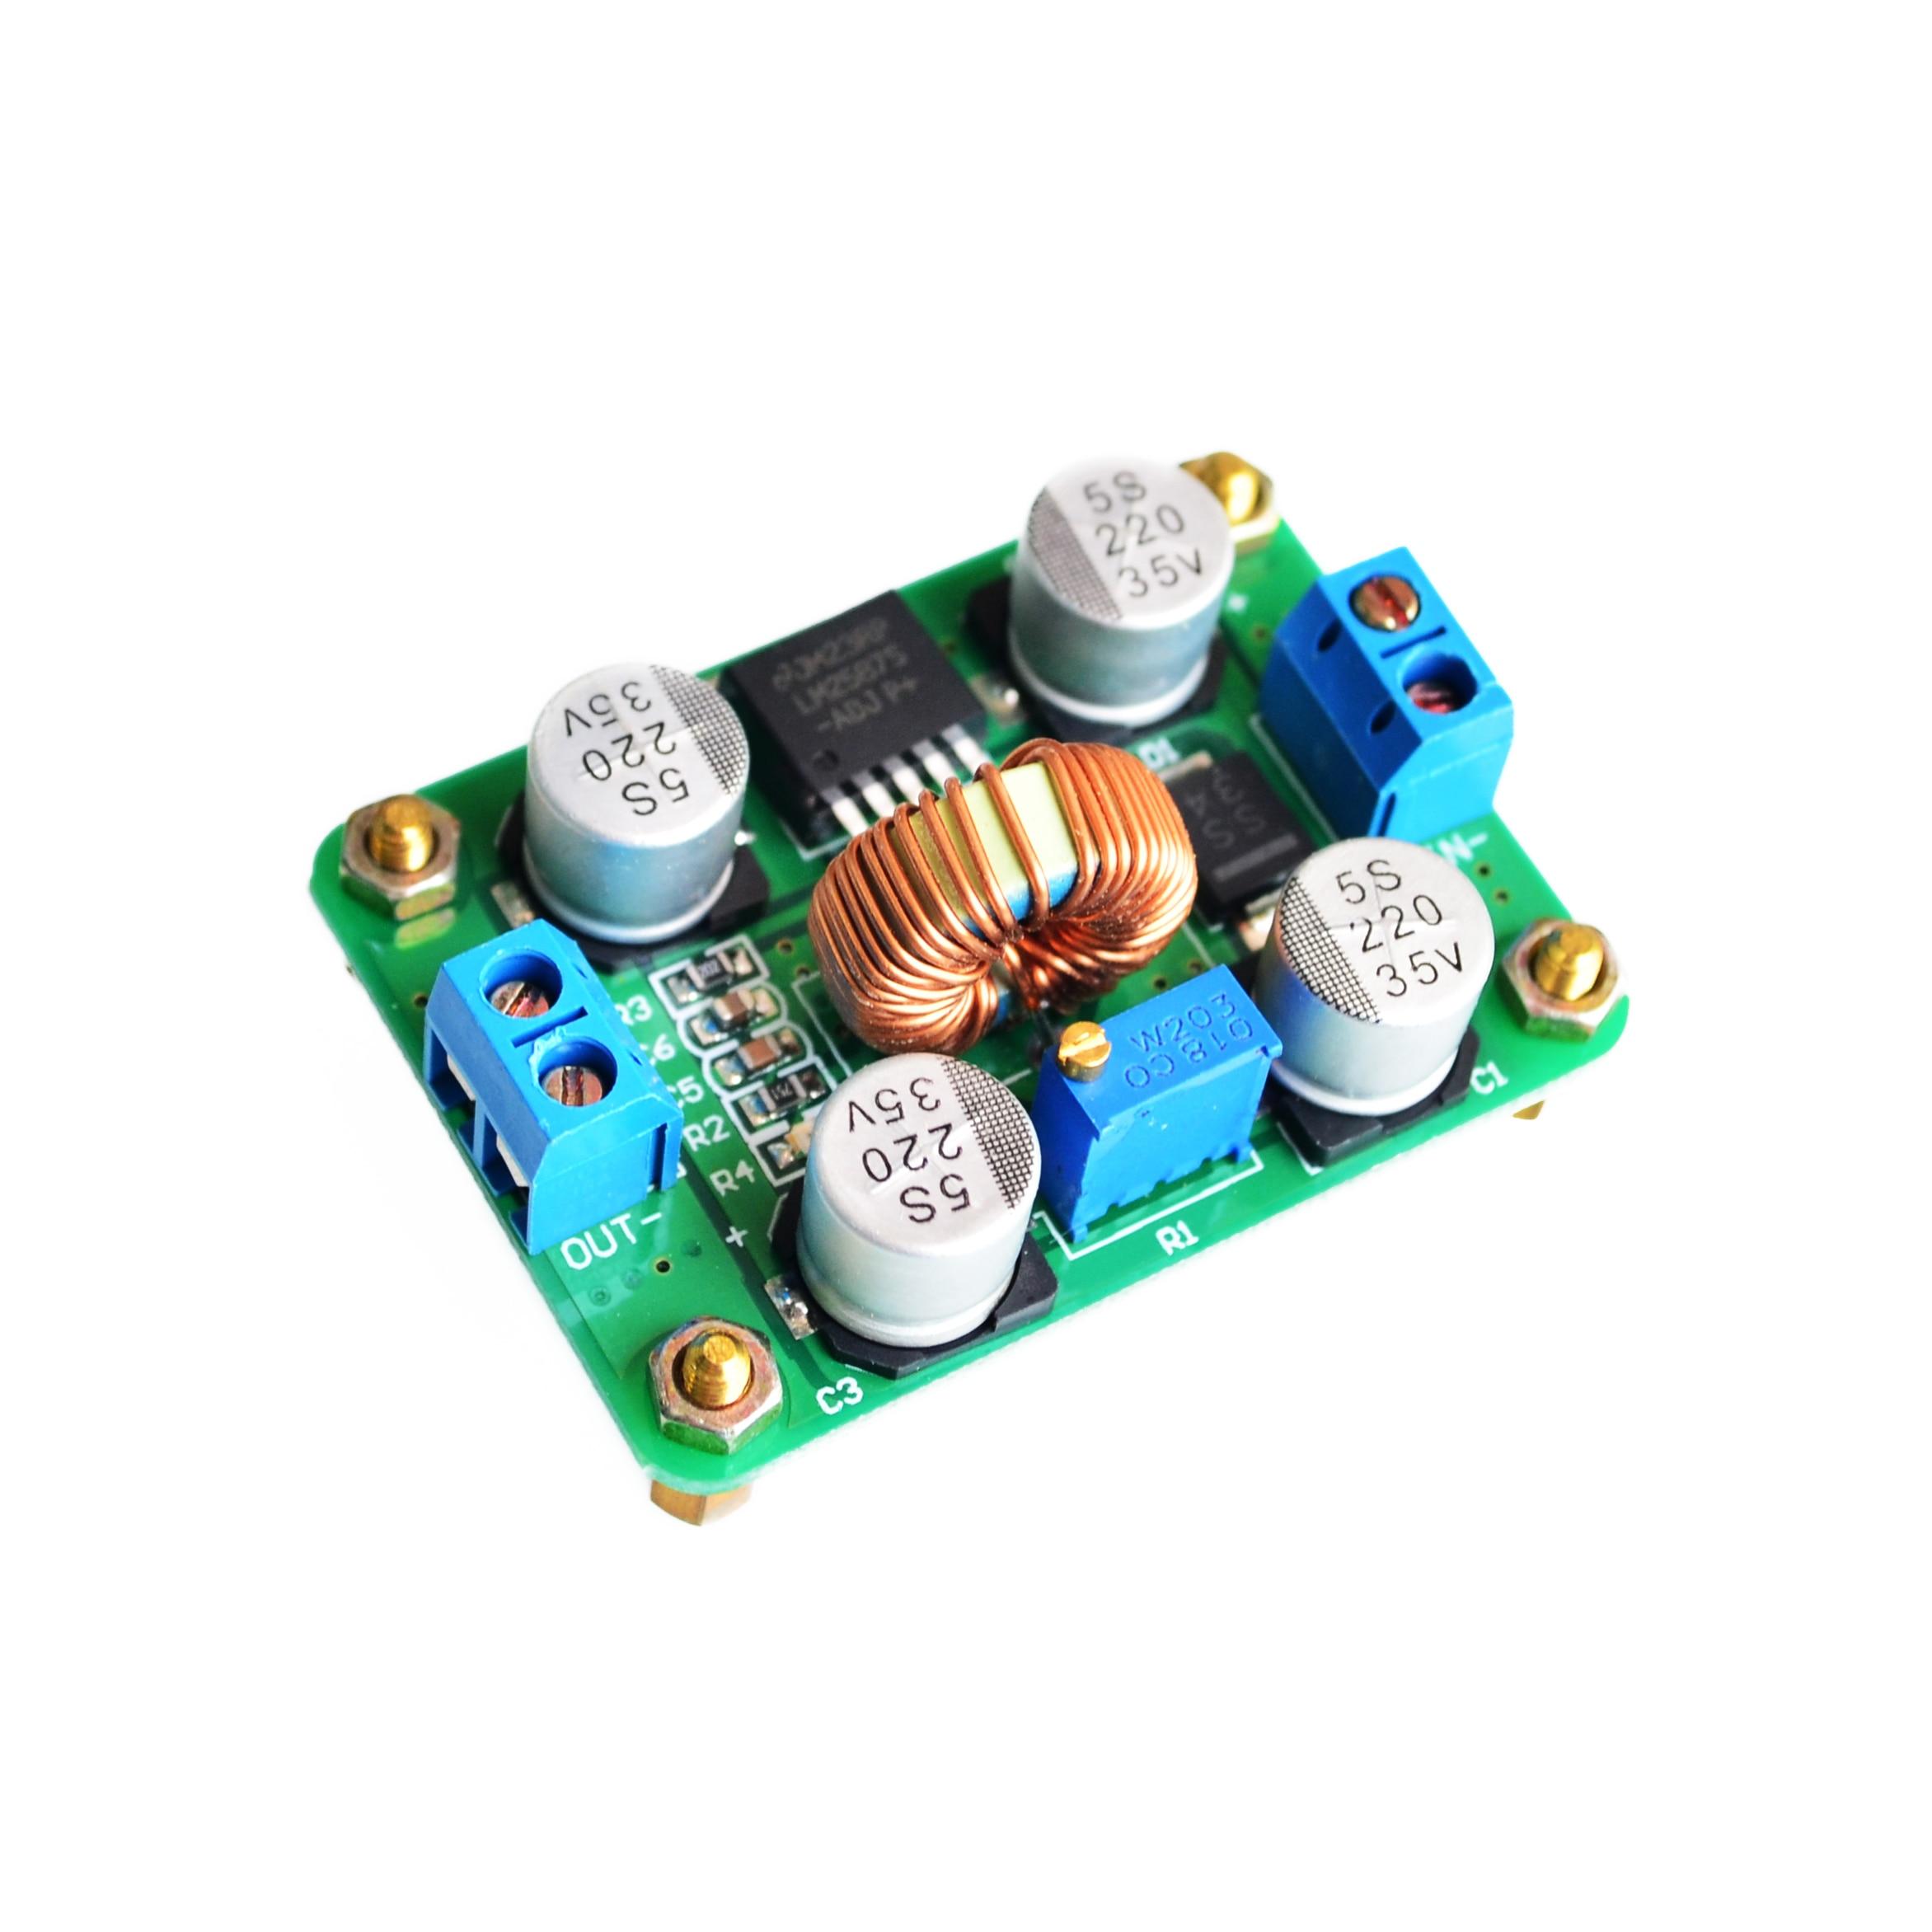 ! Lm2587 Dc-dc Power Modules Boost Module Over Lm2577 (peak 5a) Dc Step-up Converter Module